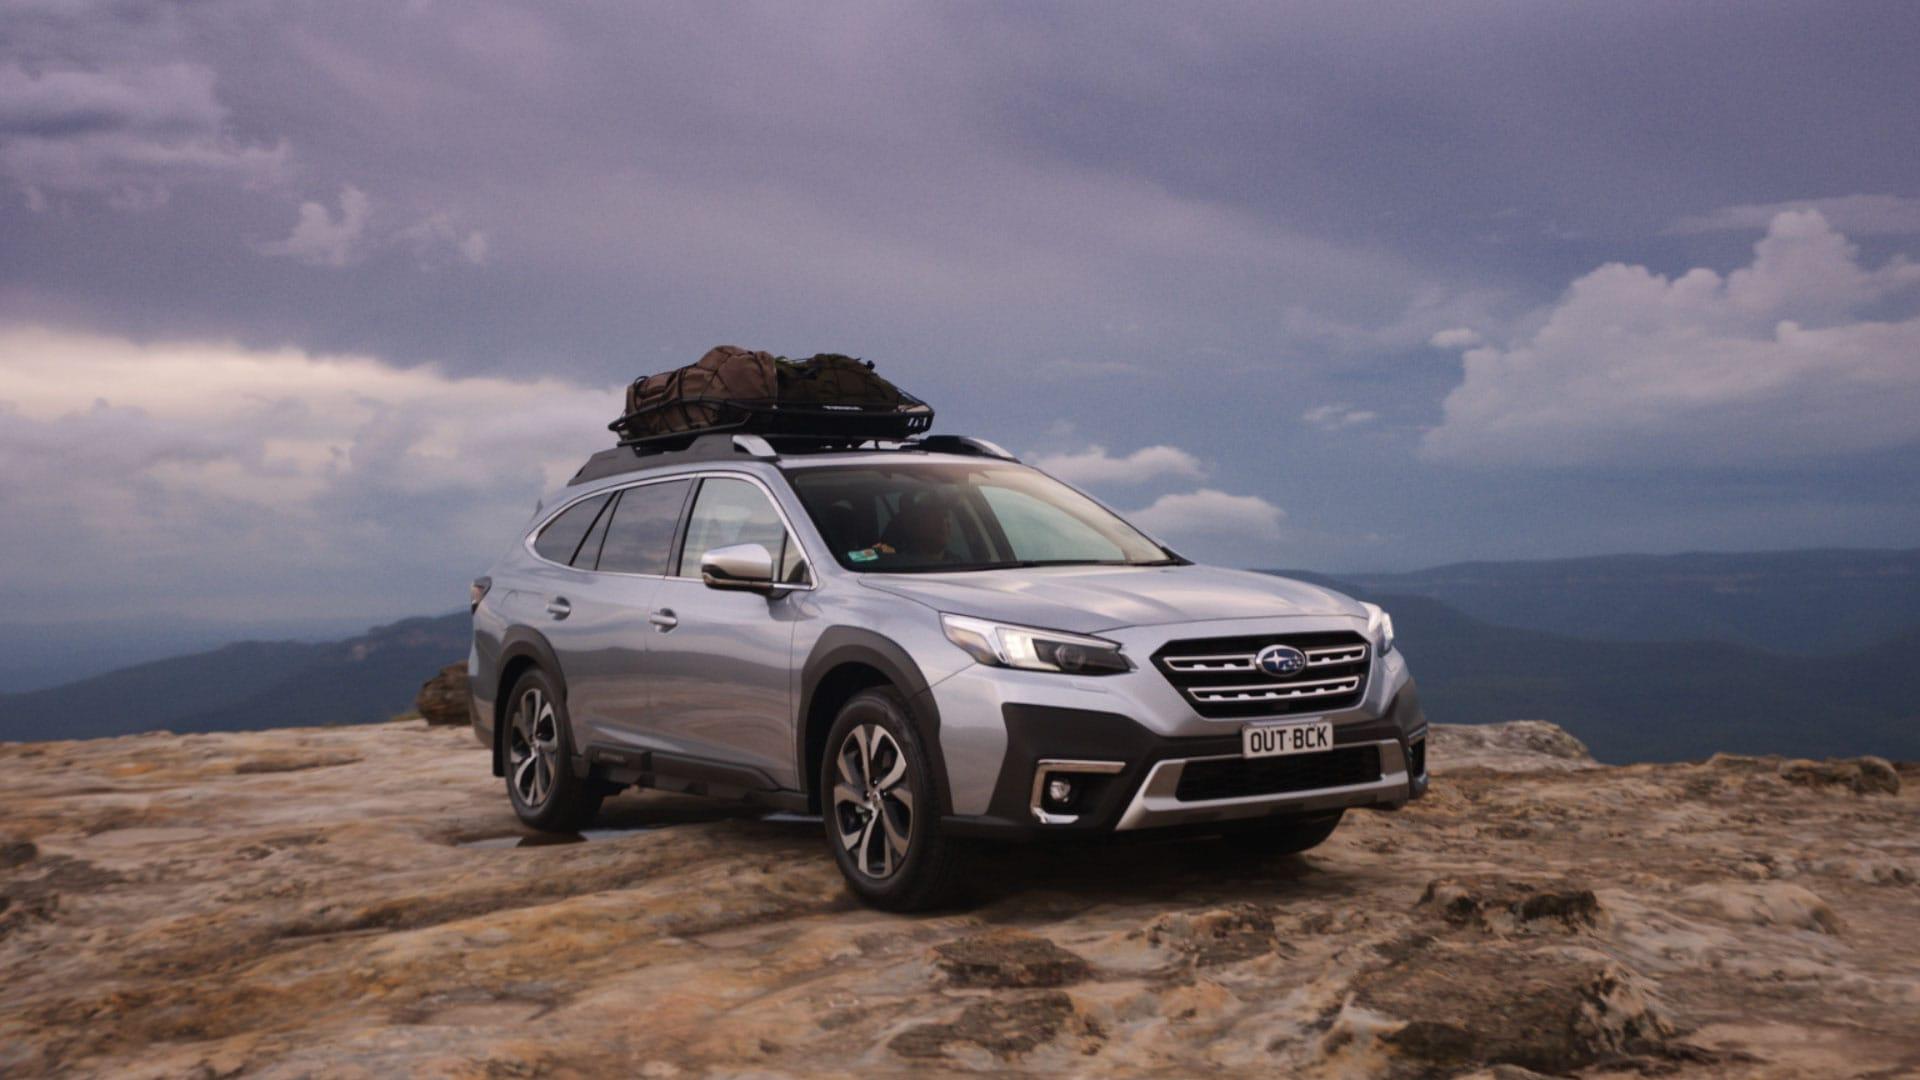 Subaru hero of the All-New All-Wheel Drive Subaru Outback